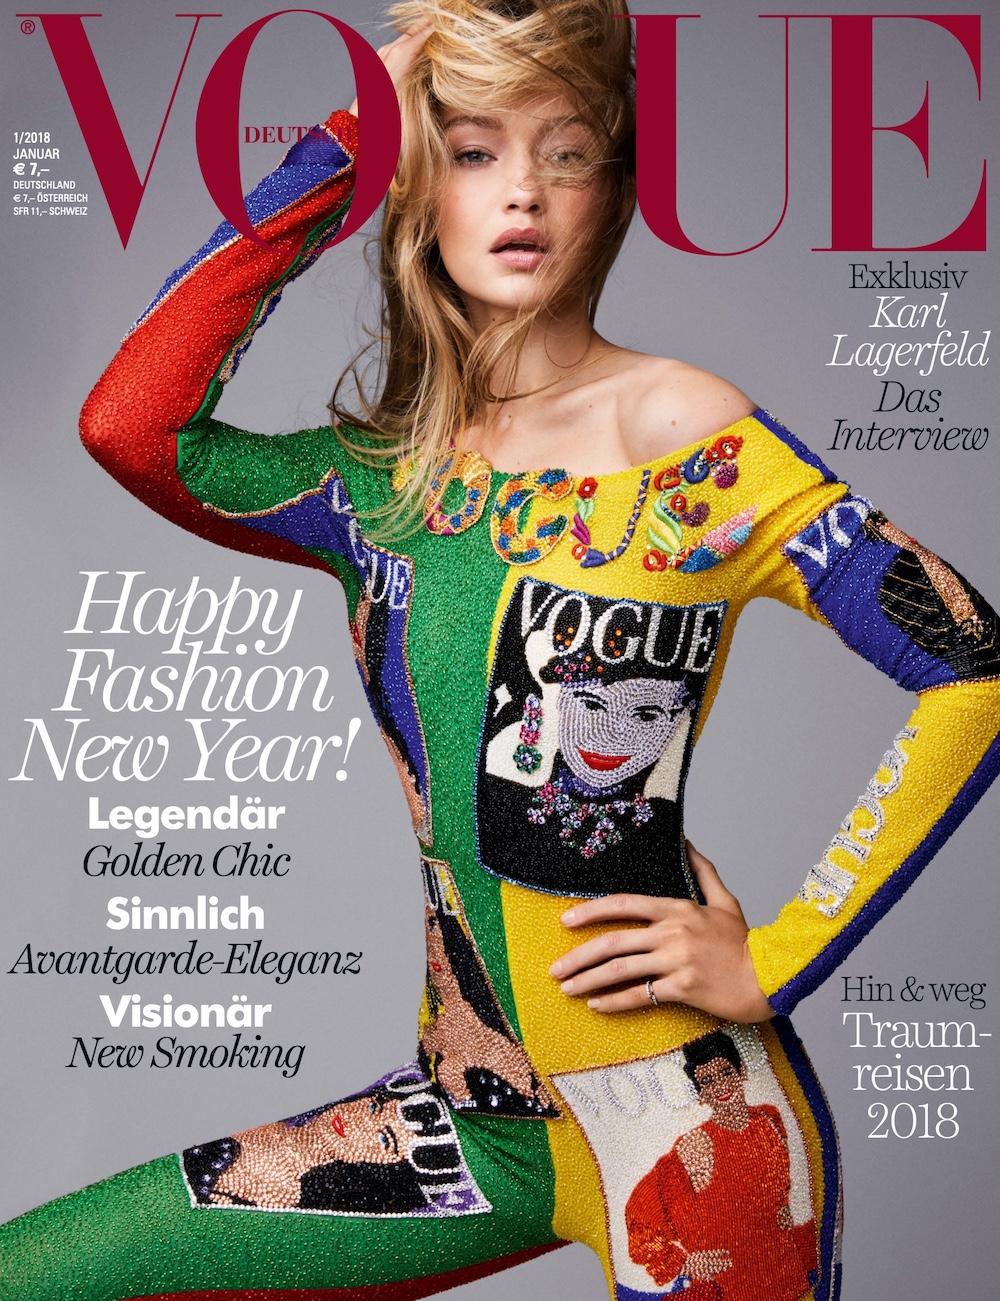 Vogue 2018-01